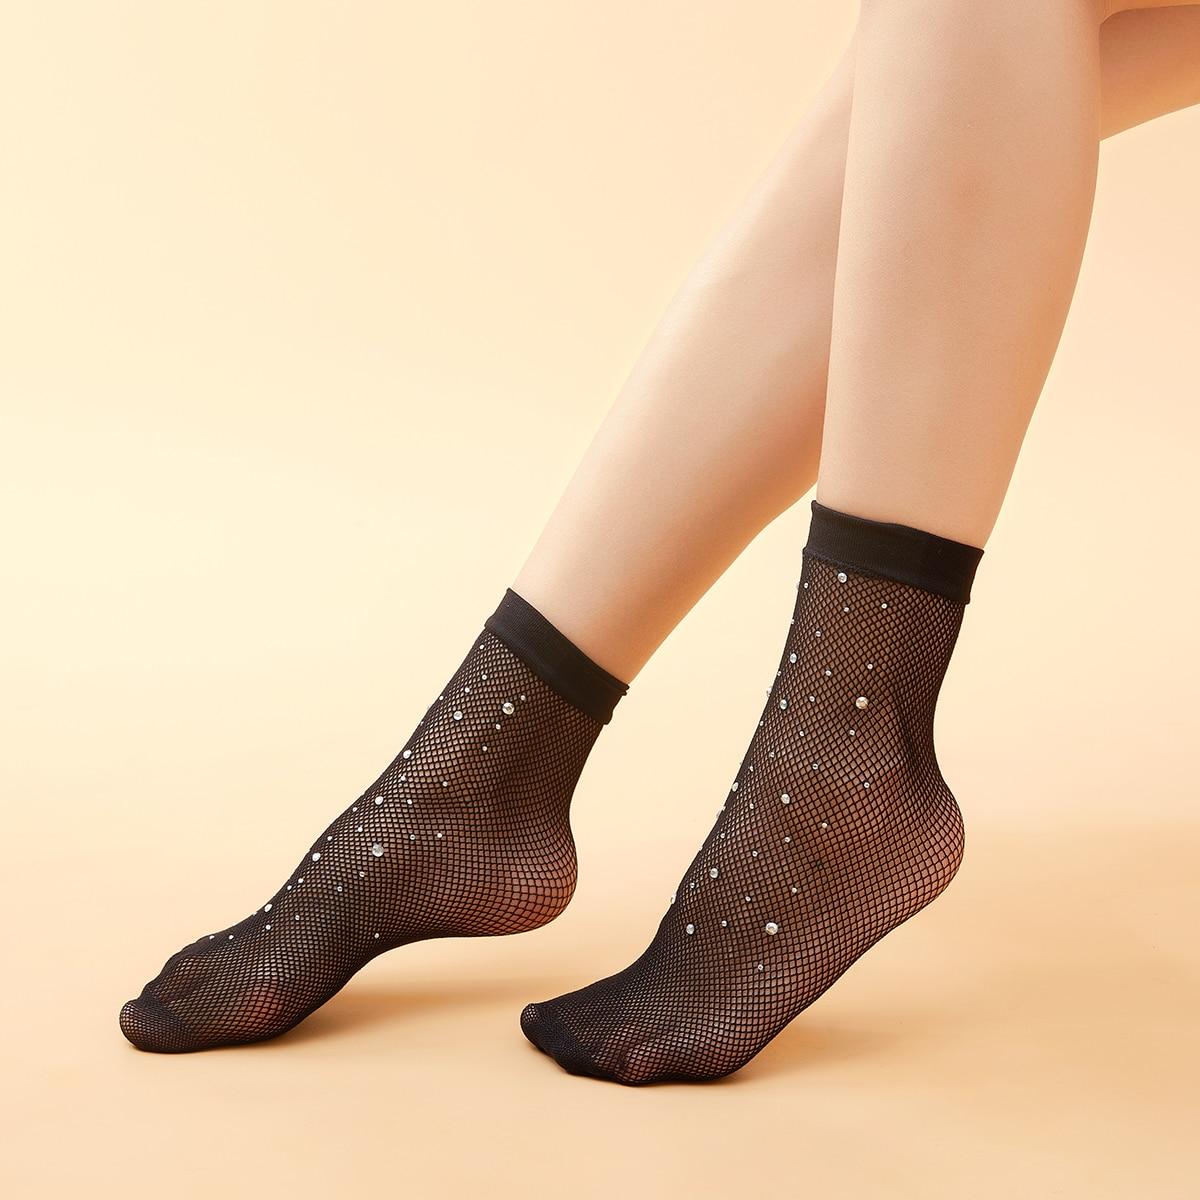 Полые носки со стразами фото